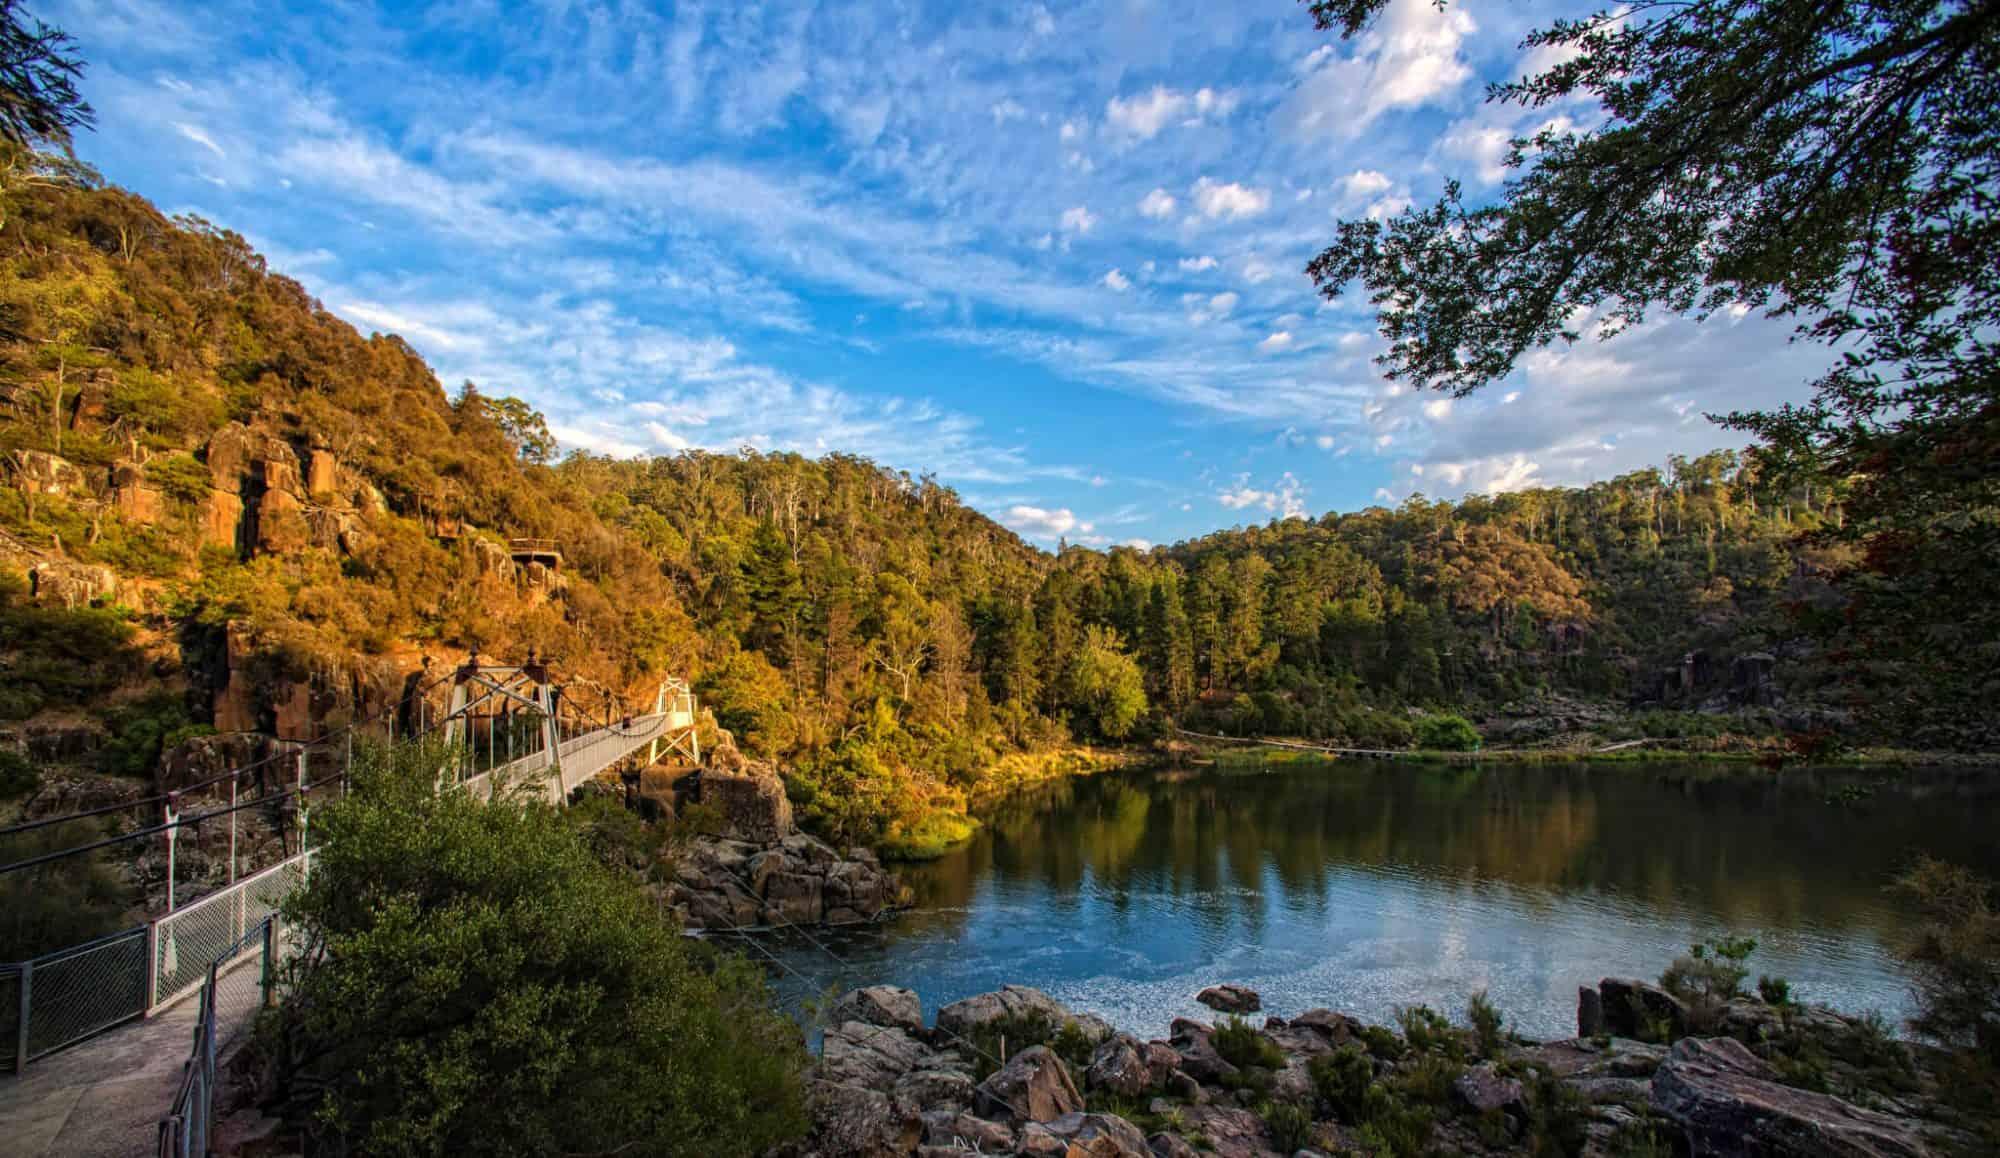 Cataract-Gorge-Tourism-Tasmania-and-Rob-Burnett-129340-2000x1158.jpg